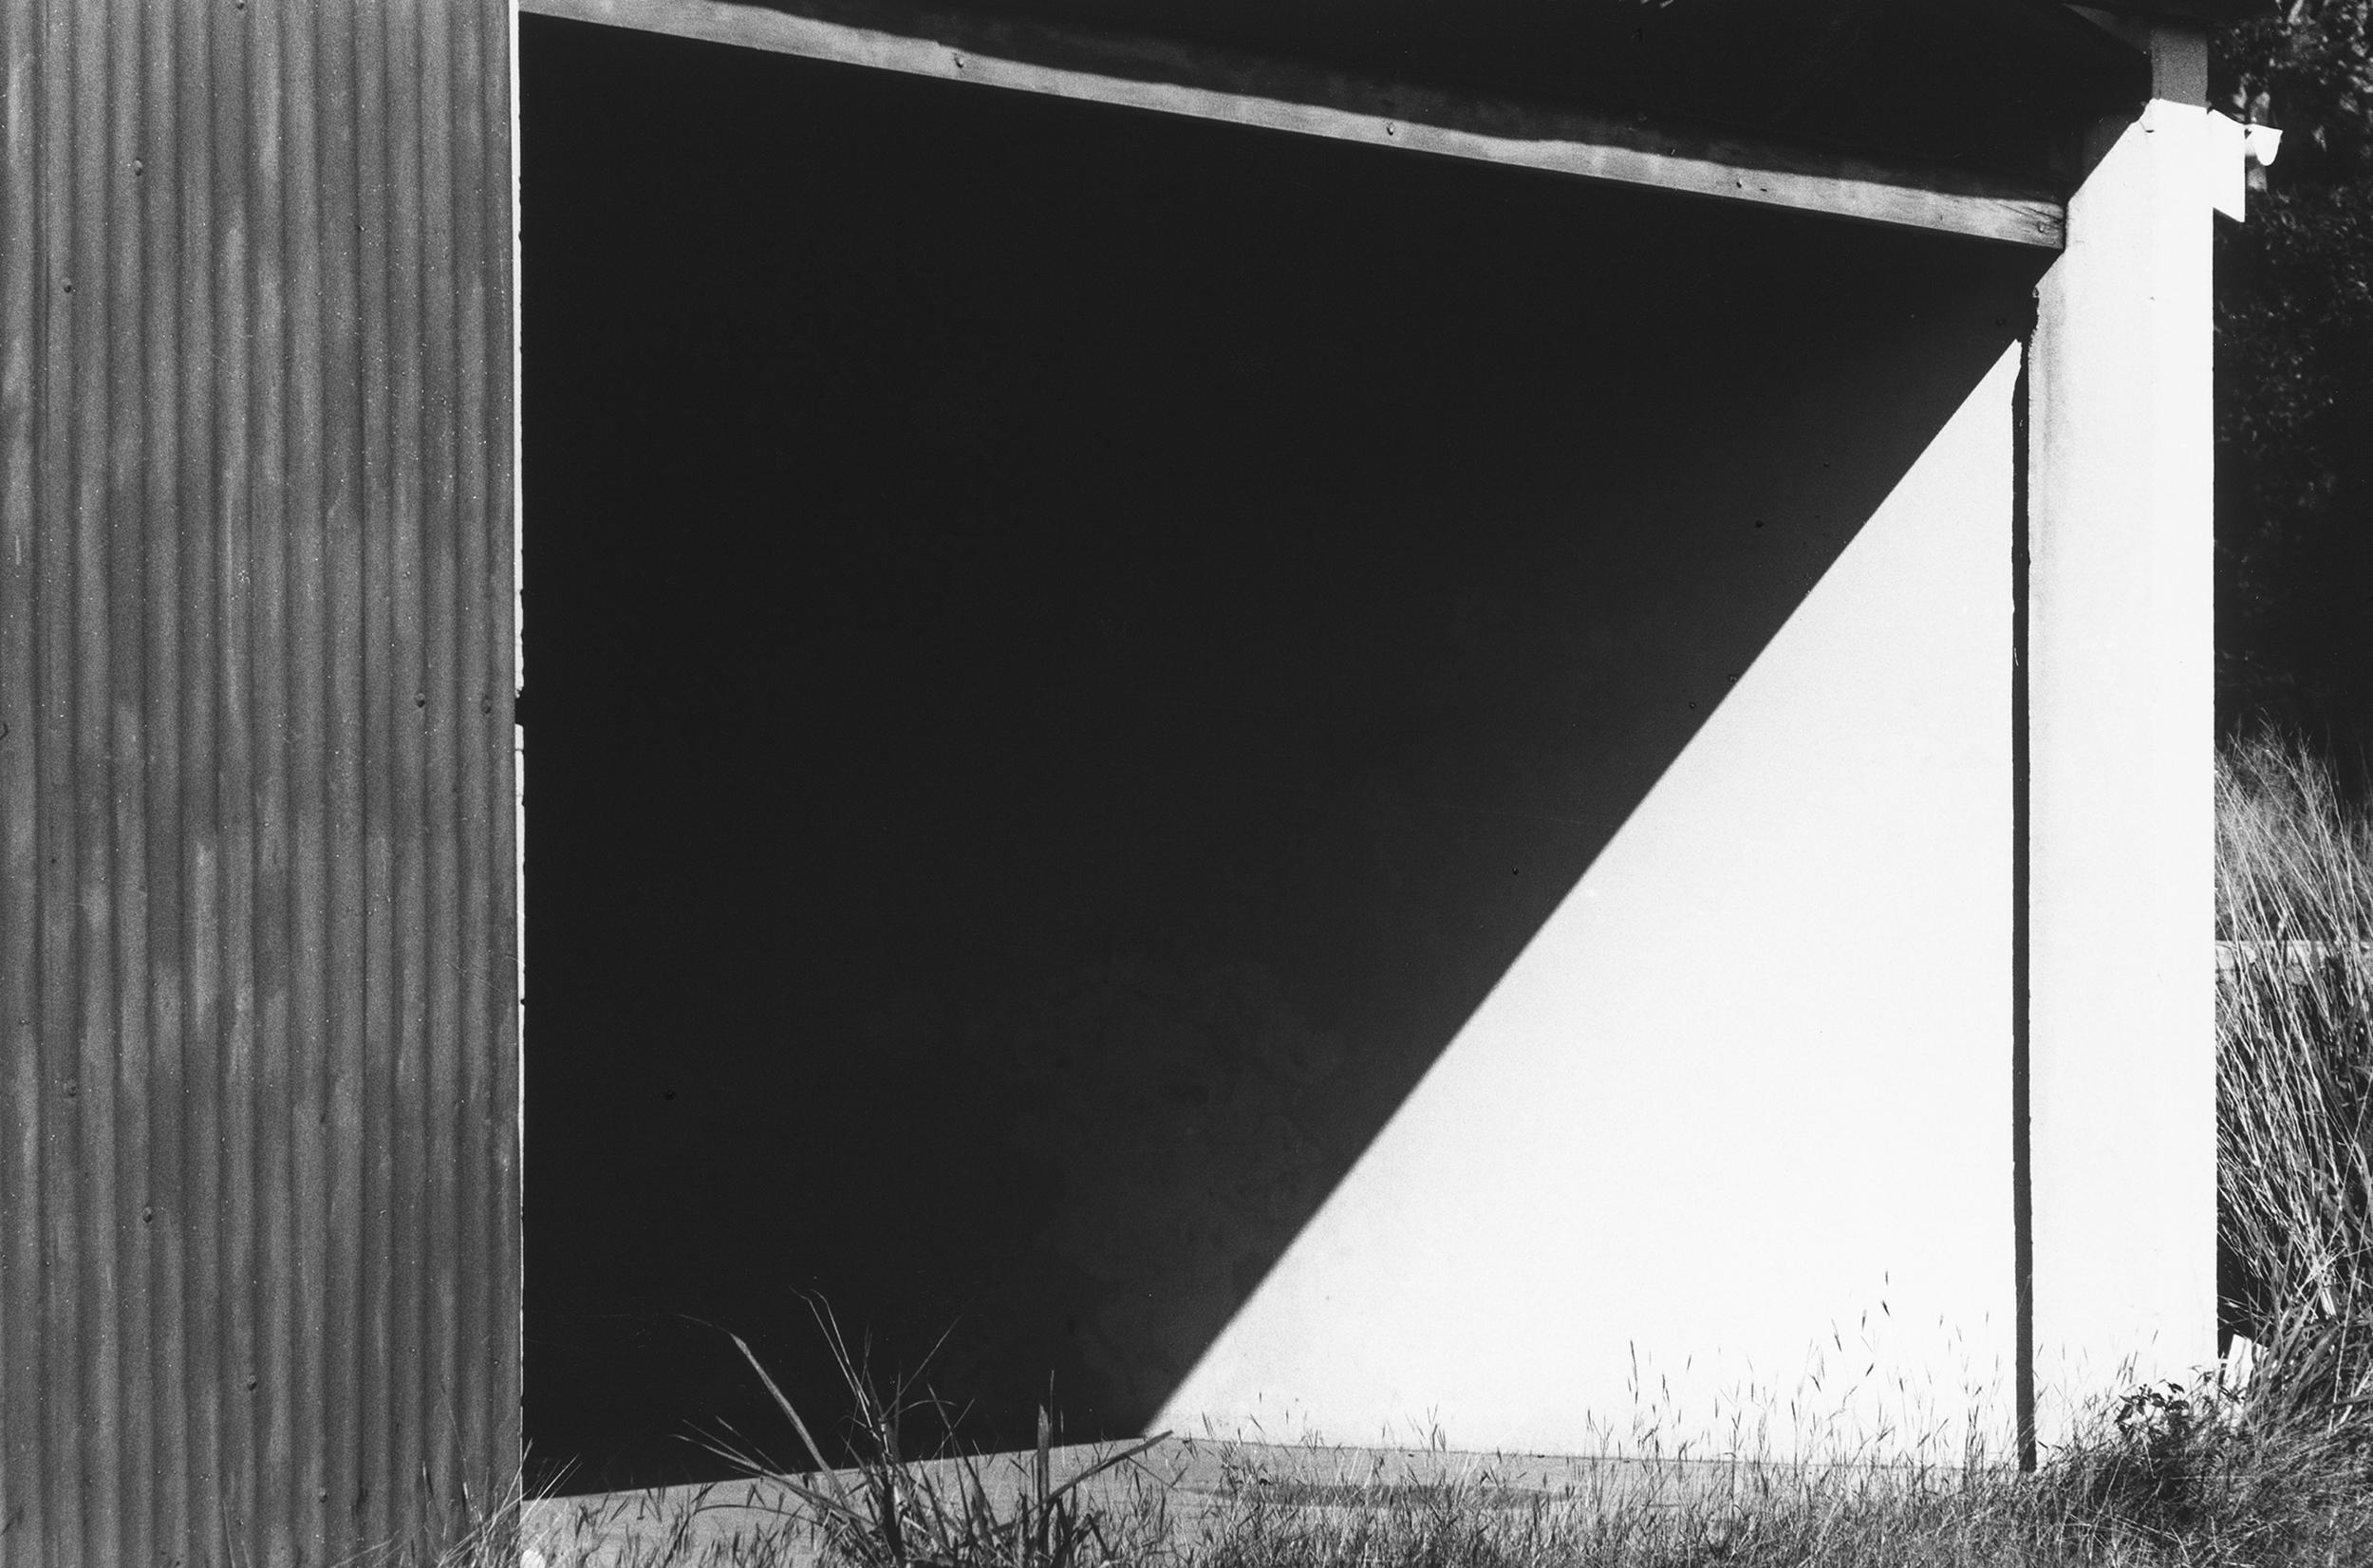 Kelly_Hangar Doorway, St. Barts_1977